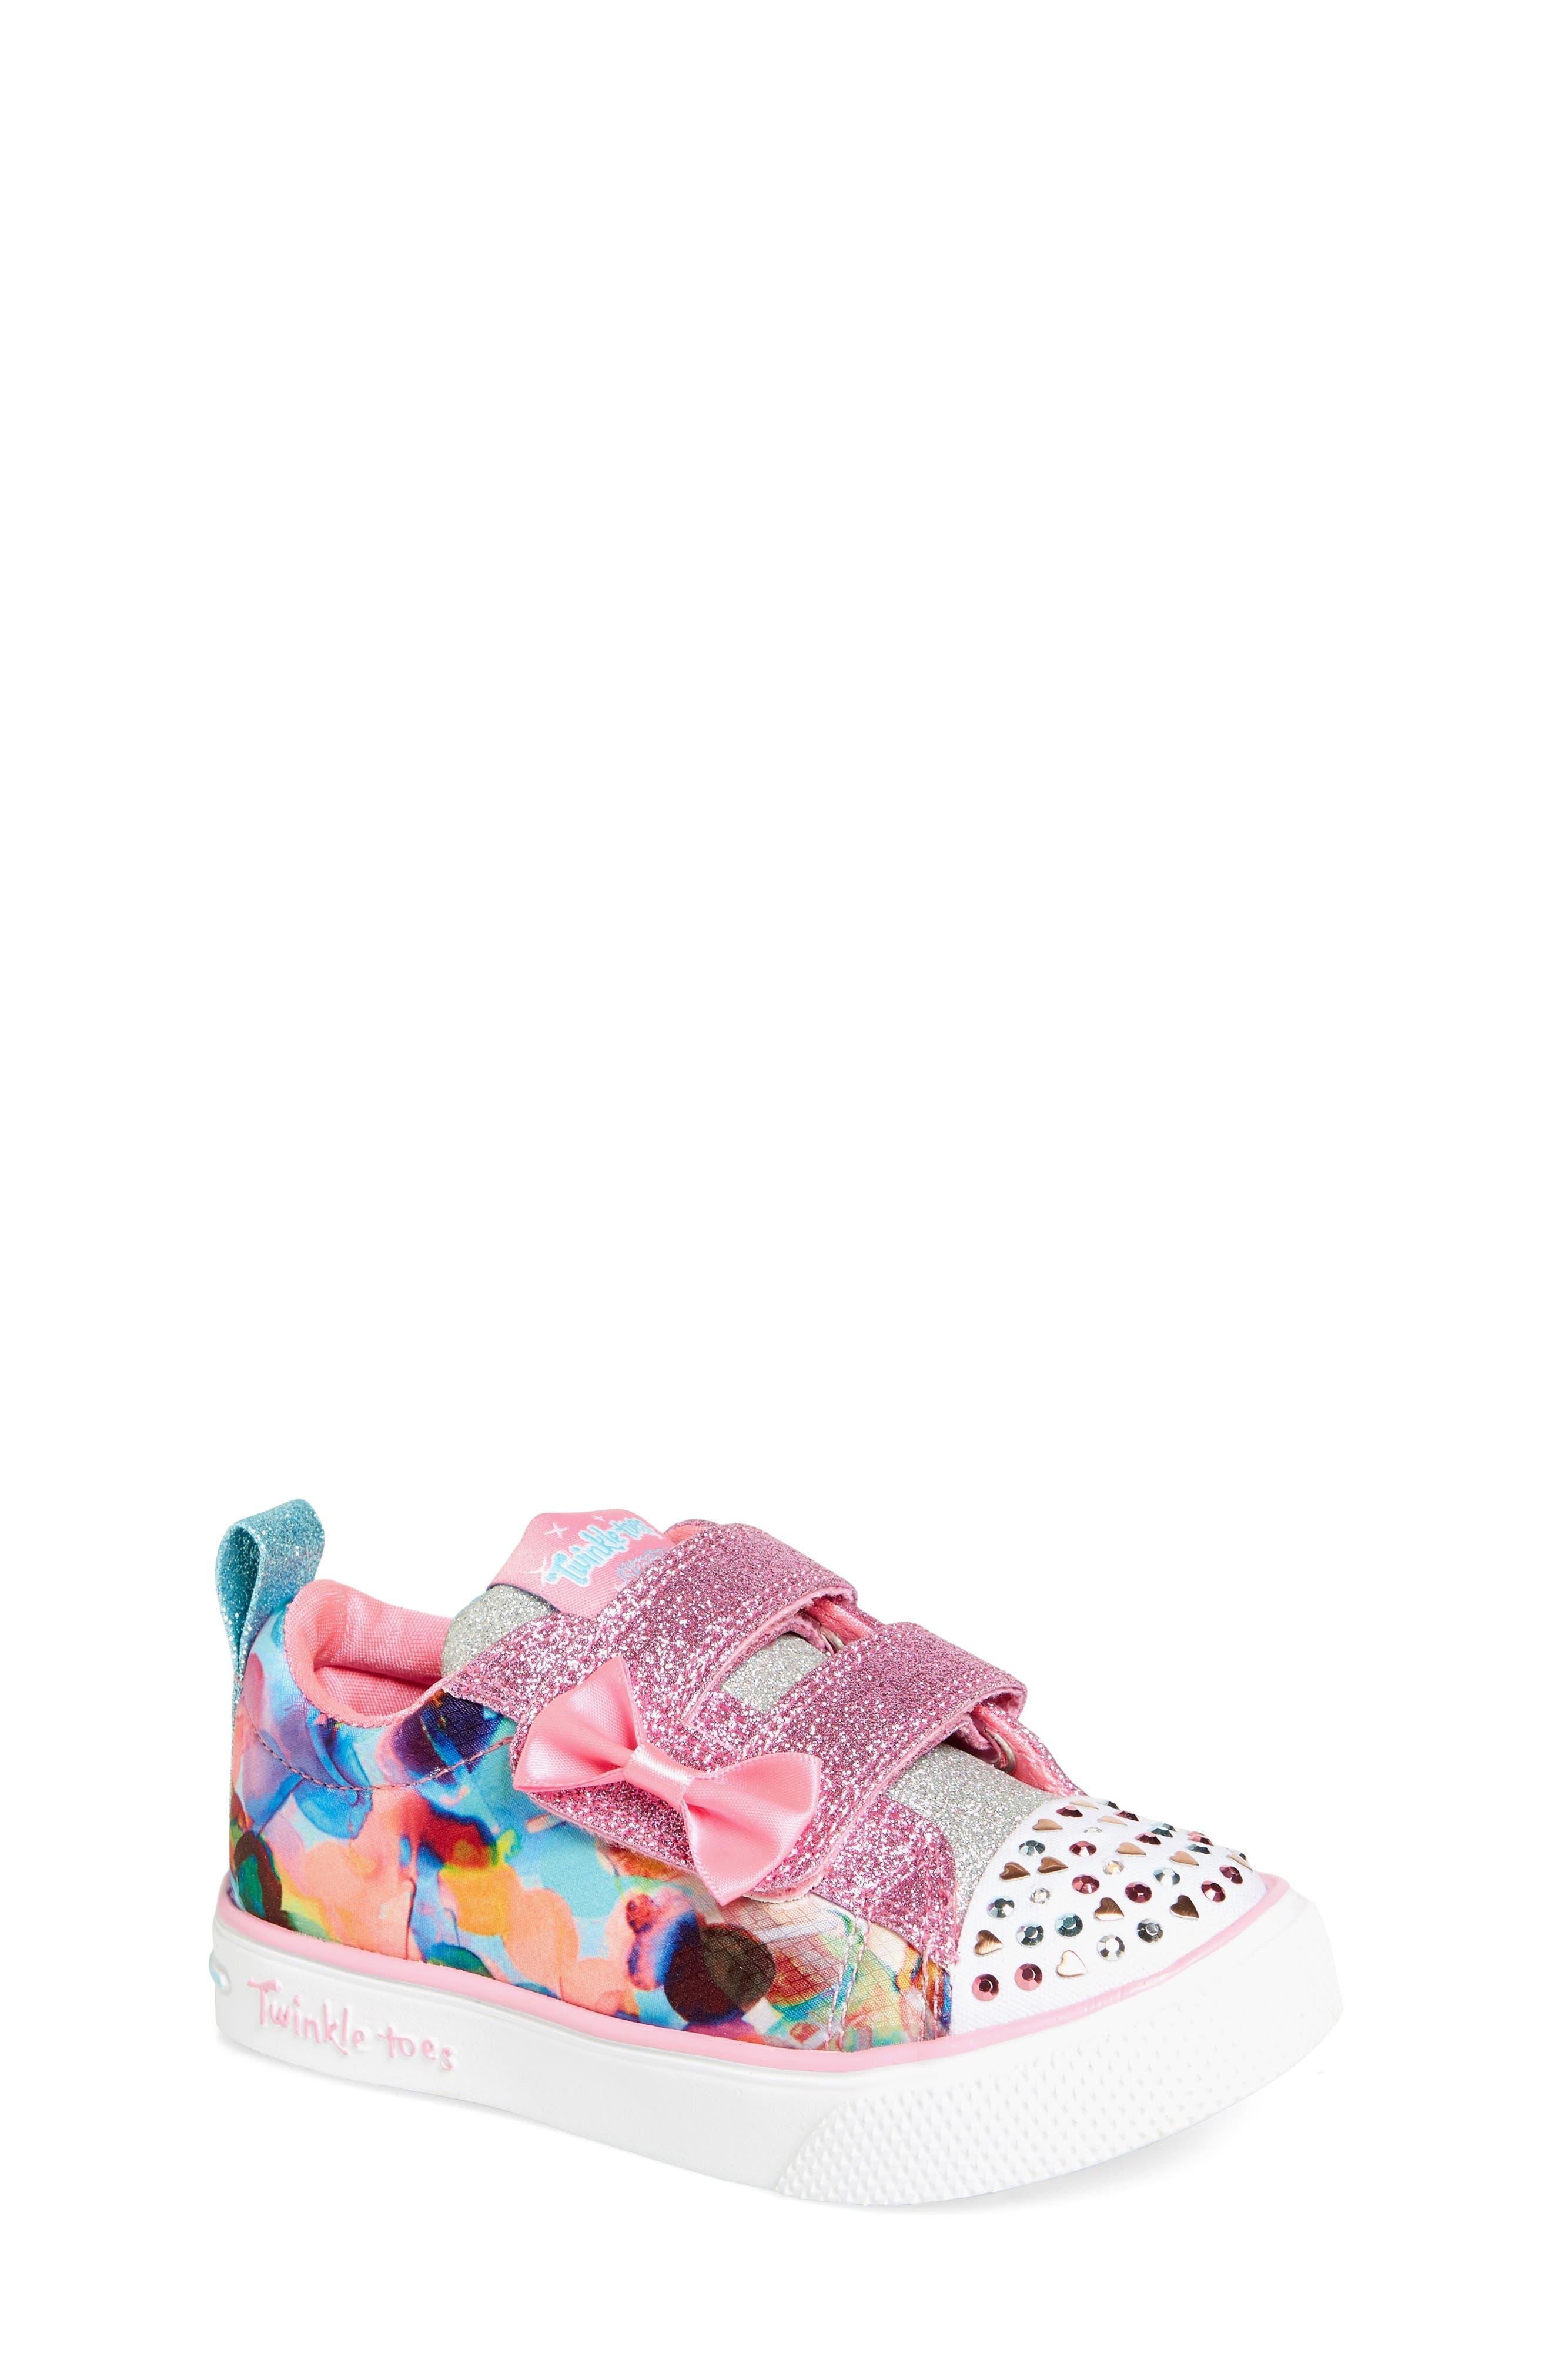 Twinkle Breeze 2.0 Princess Sneaker,                         Main,                         color, Multi